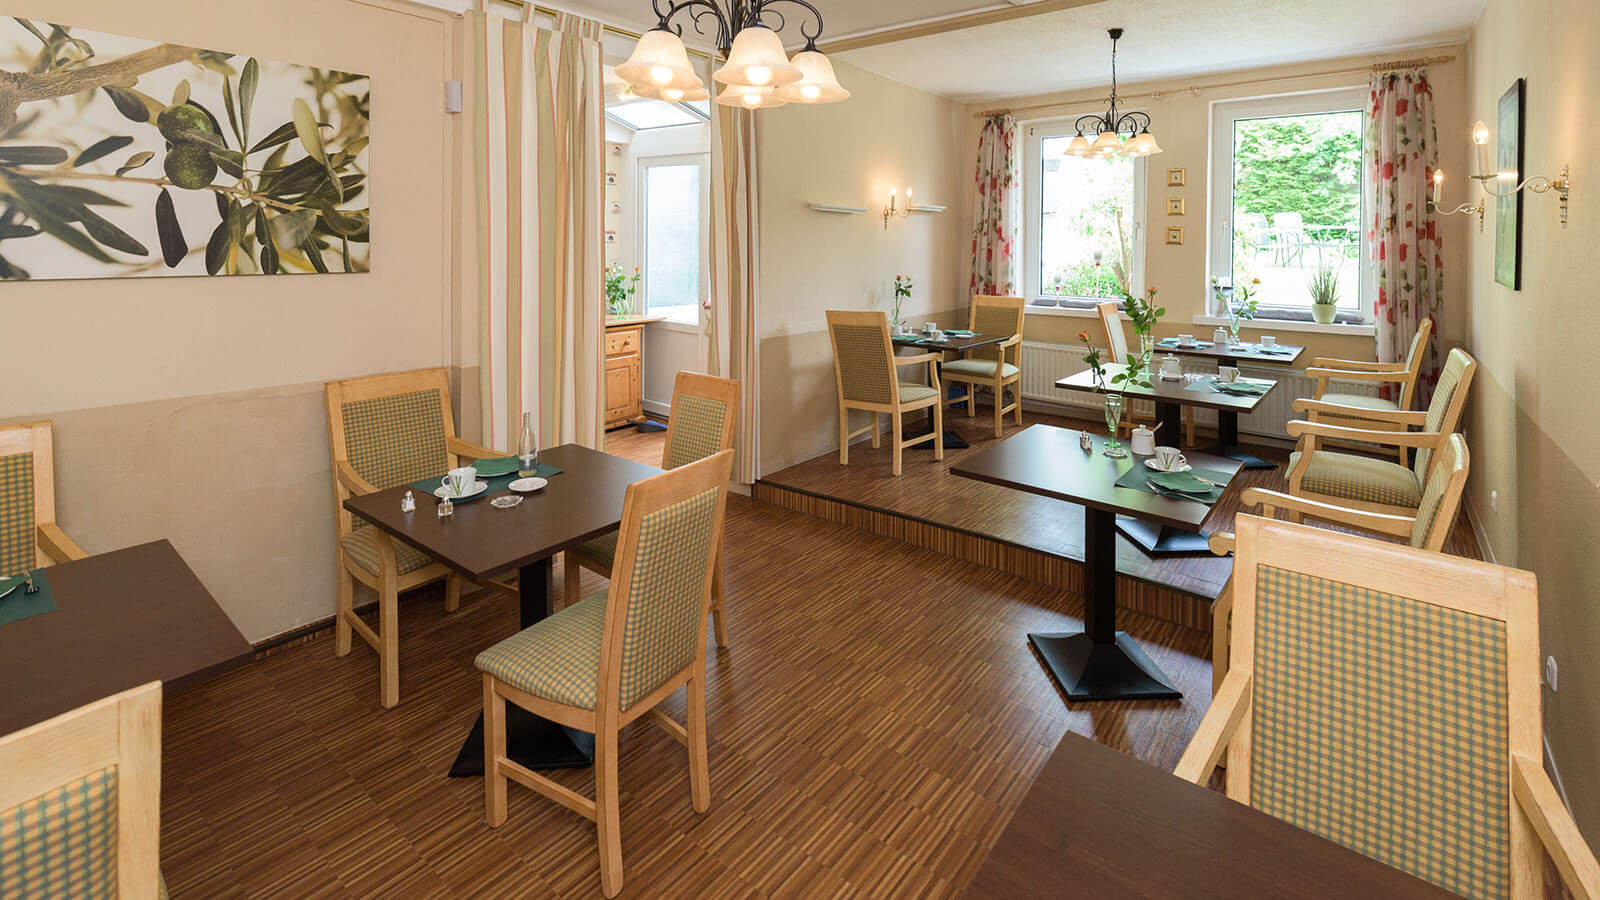 Frühstücksraum im Hotel Goethe Haus